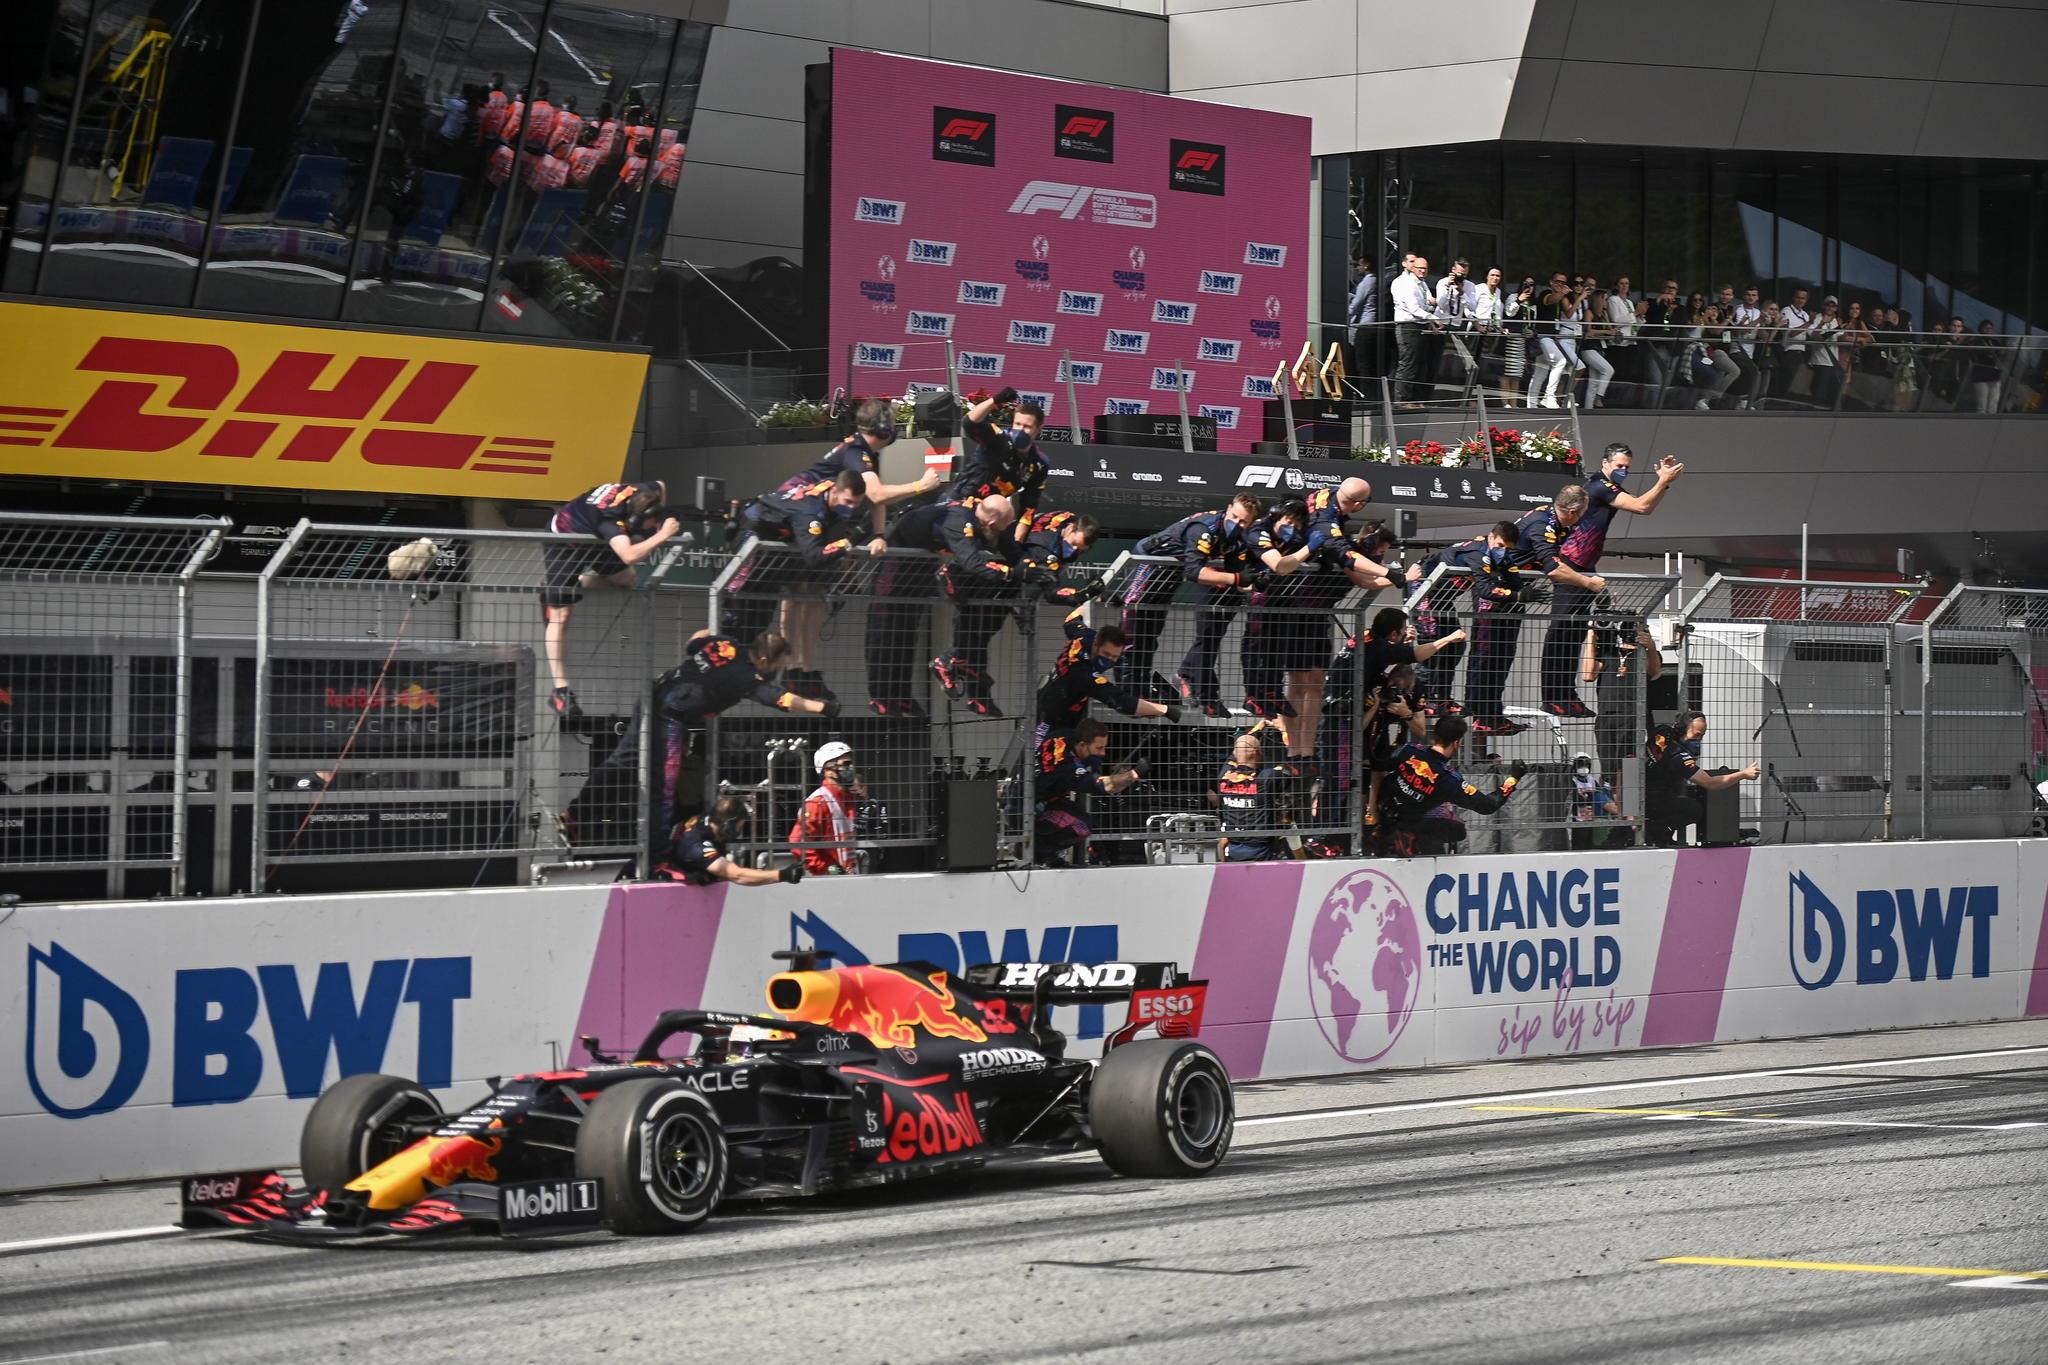 Spielberg (Austria), 04/07/2021.- Dutch Formula One driver lt;HIT gt;Max lt;/HIT gt; lt;HIT gt;Verstappen lt;/HIT gt; of Red Bull Racing wins the Formula One Grand Prix of Austria at the Red Bull Ring in Spielberg, Austria, 04 July 2021. (Fórmula Uno) EFE/EPA/CHRISTIAN BRUNA